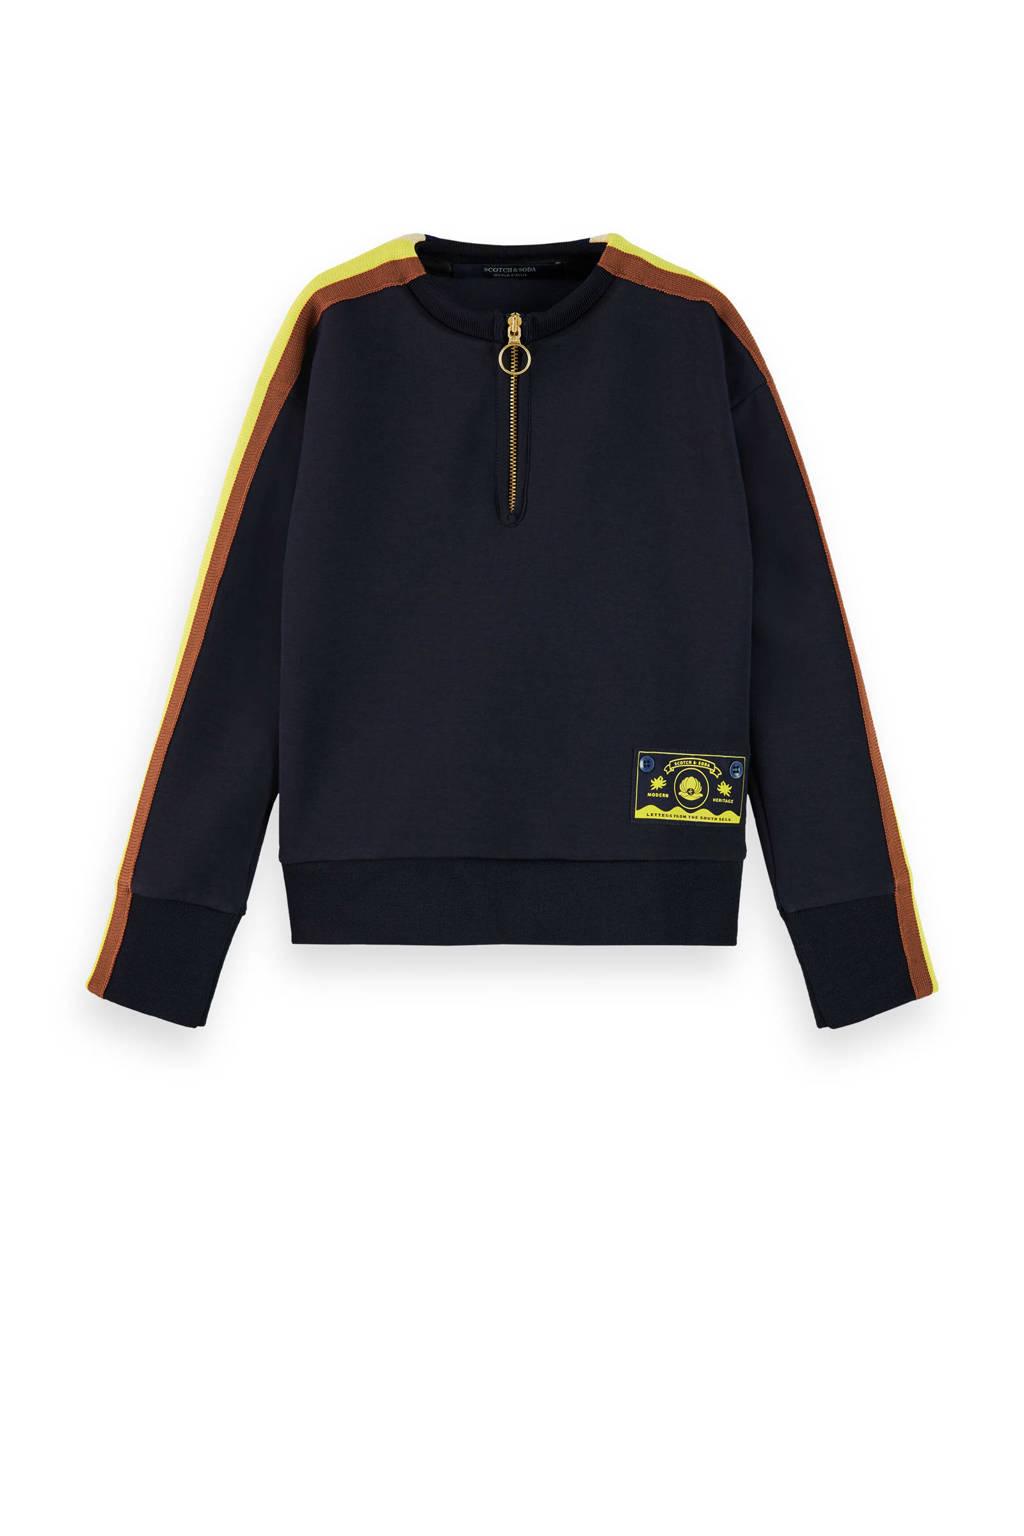 Scotch & Soda sweater donkerblauw/bruin/geel, Donkerblauw/bruin/geel